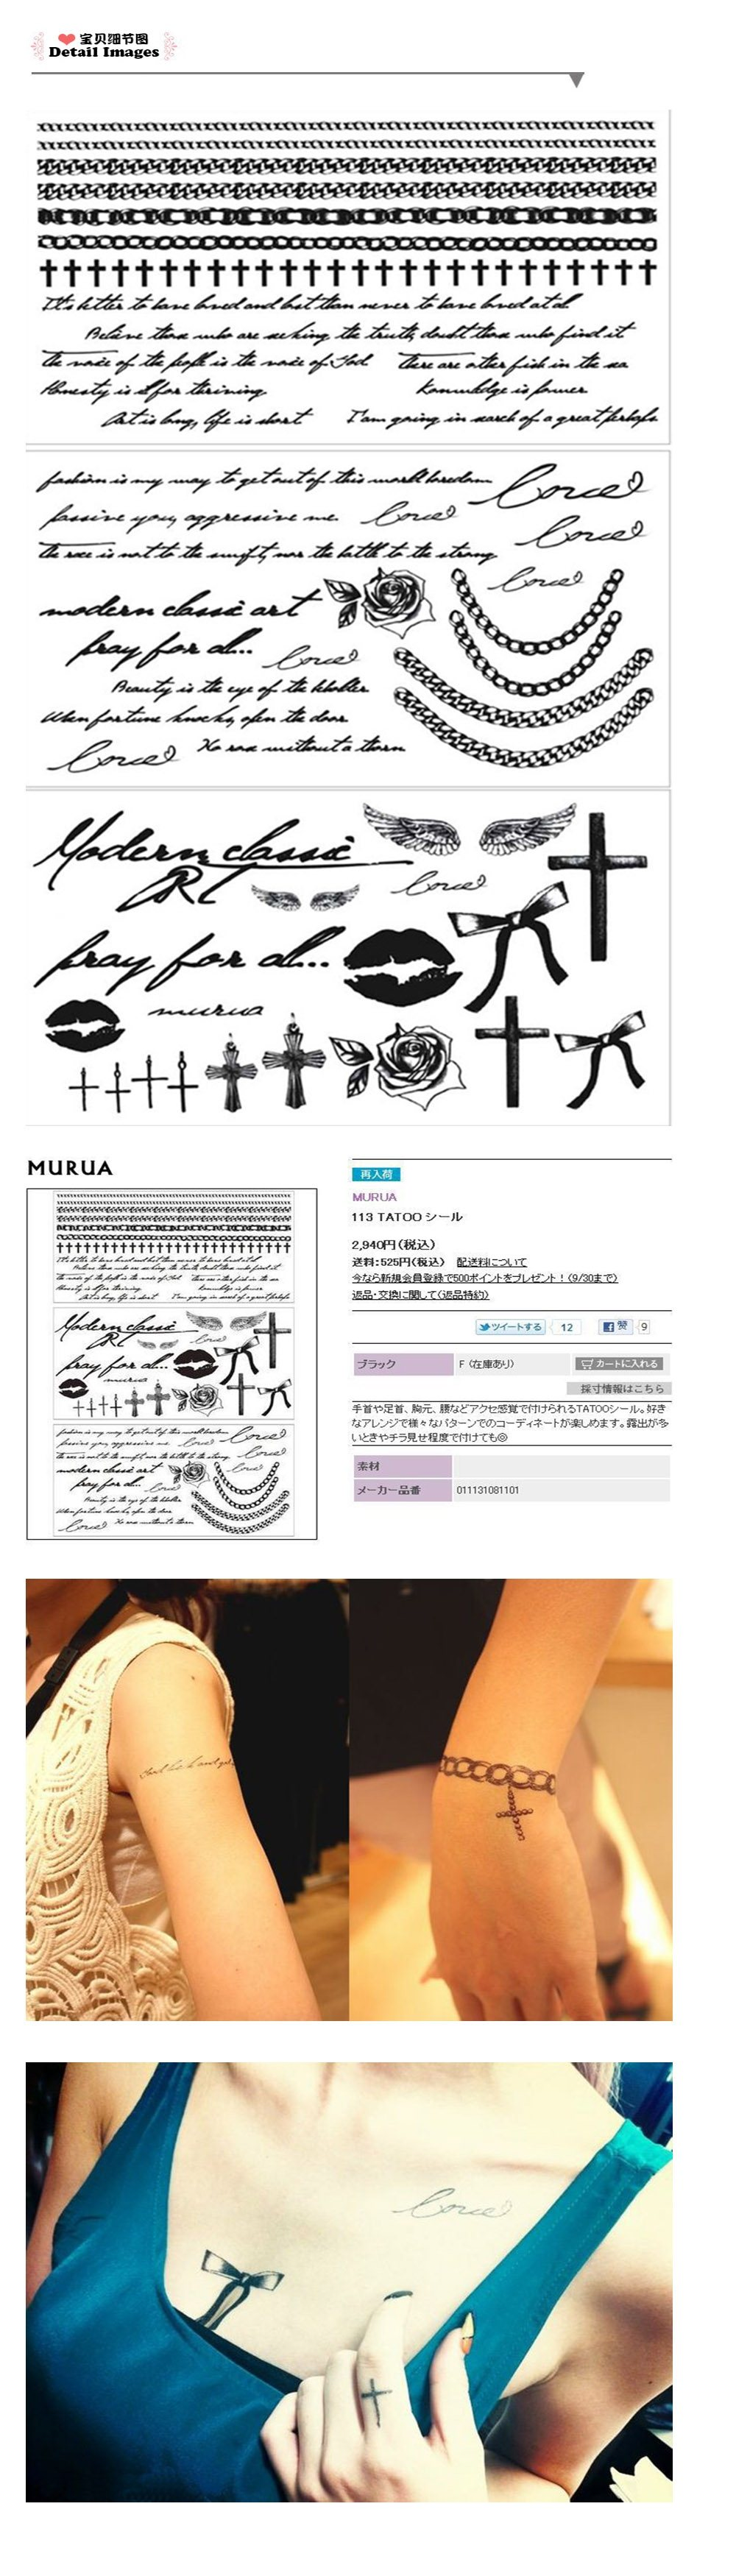 BRAND NEW****** Murua Temporary Body Tattoo Sticker Set****  Style 2